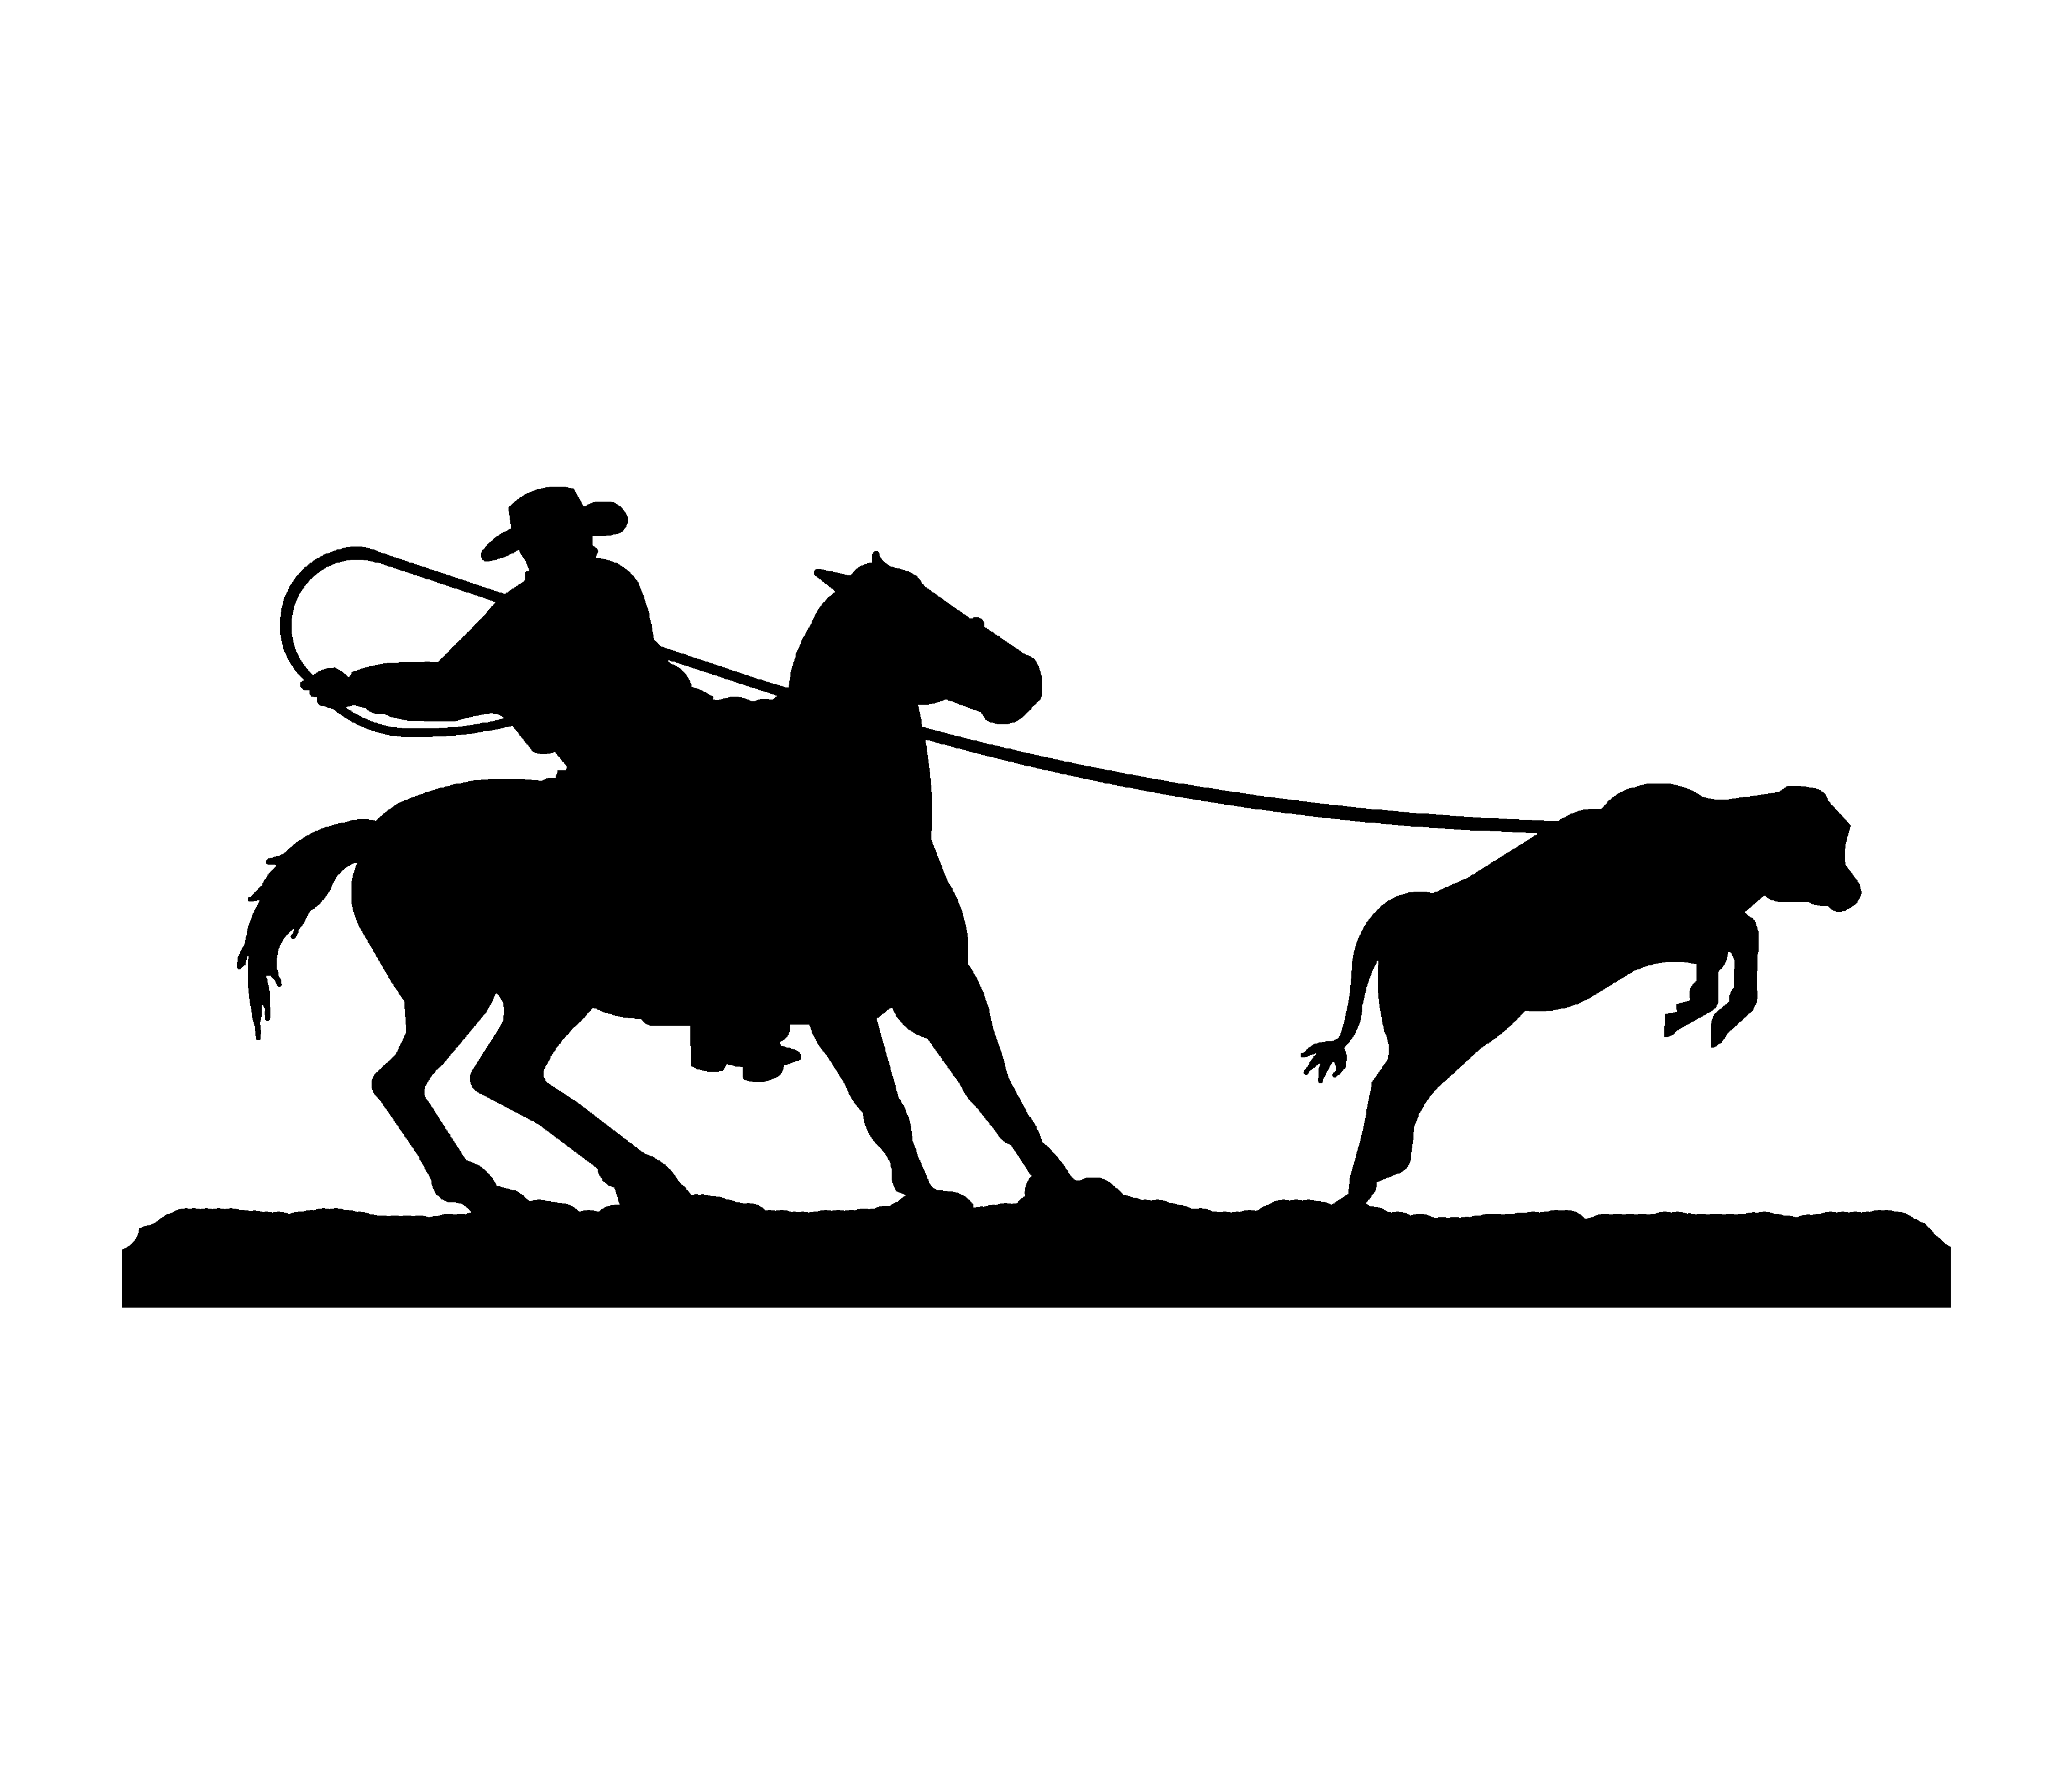 Cowboy Silhouette Clip Art